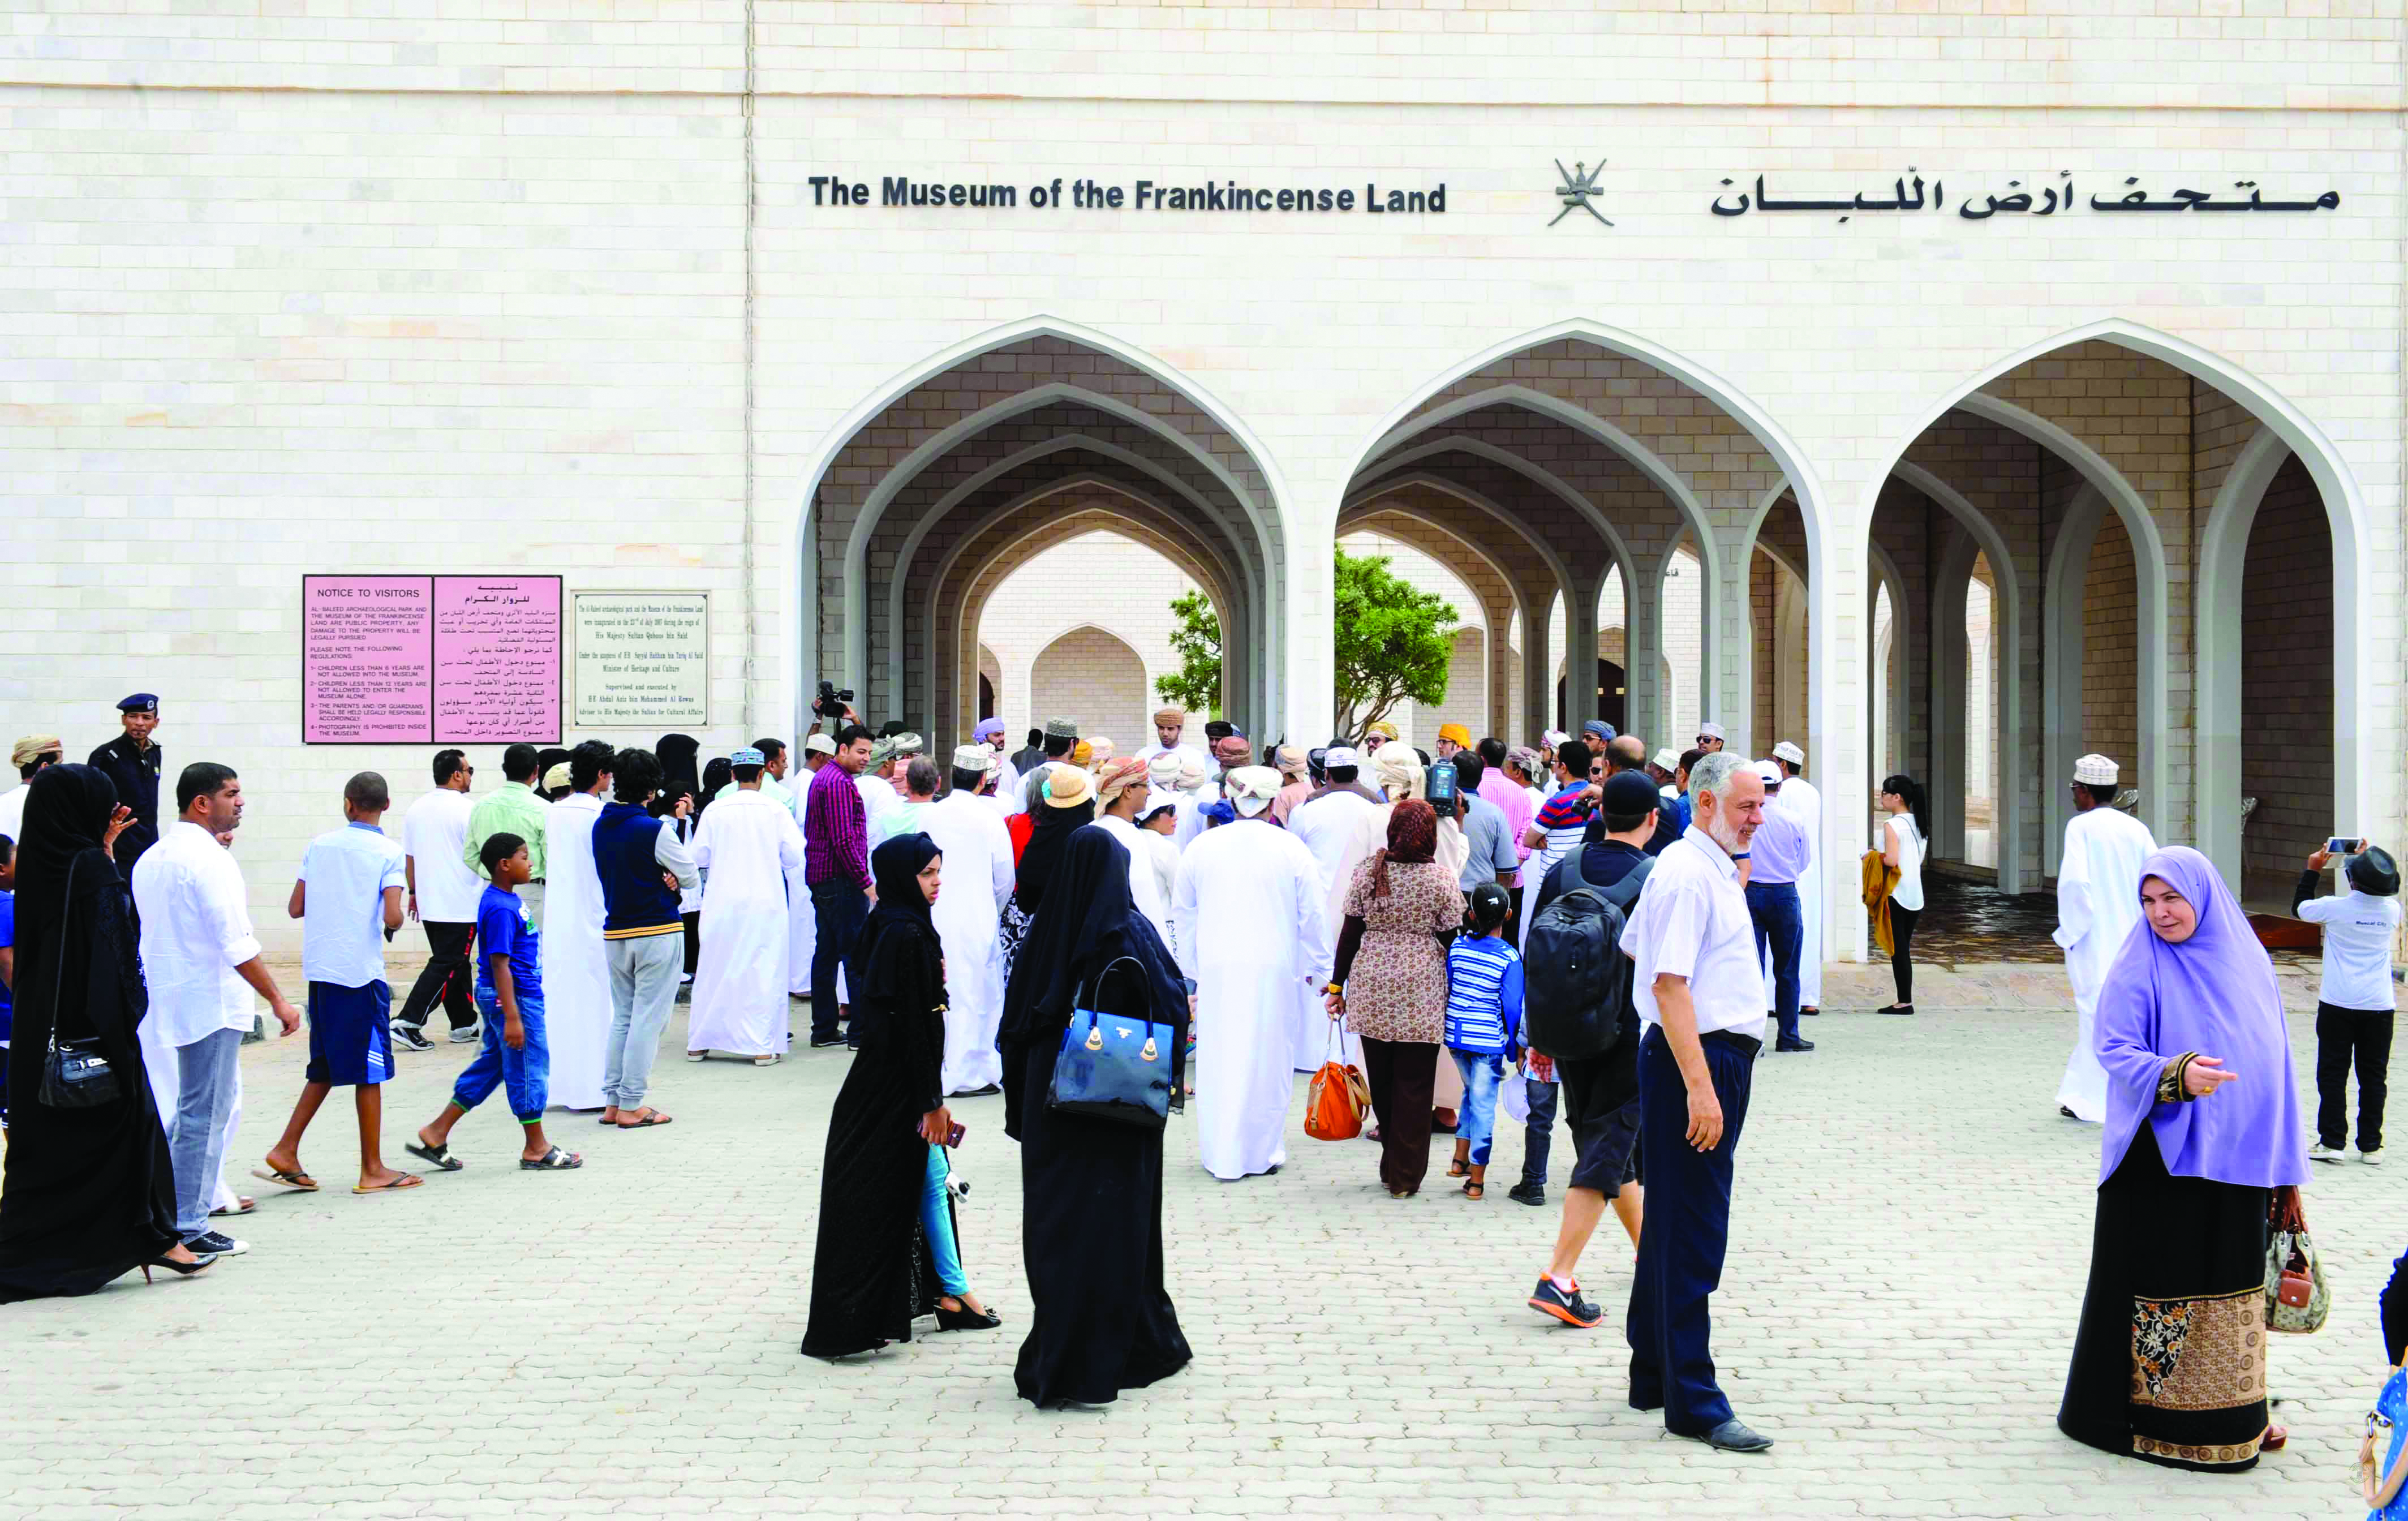 Oman tourism: Tourists flock to Dhofar archaeological sites